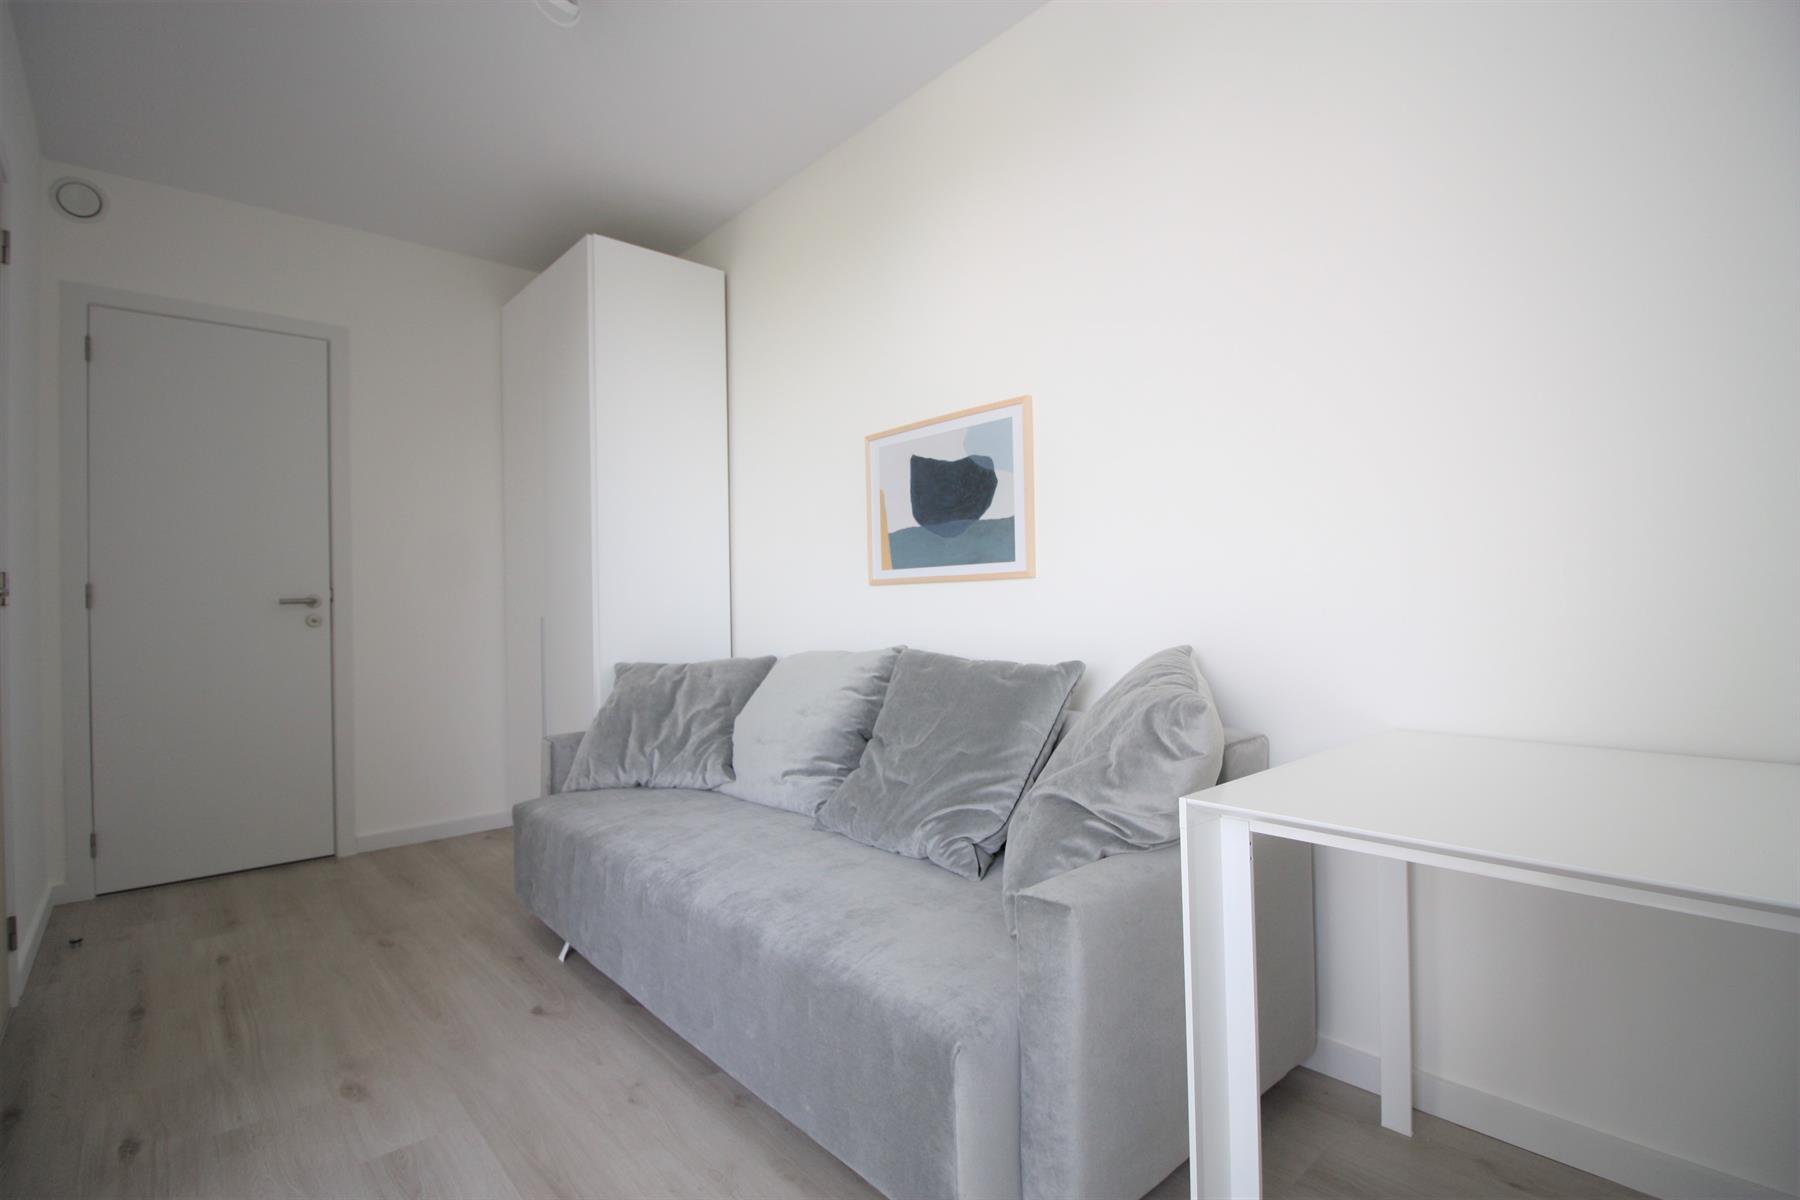 Appartement - Woluwe-Saint-Lambert - #4395355-9